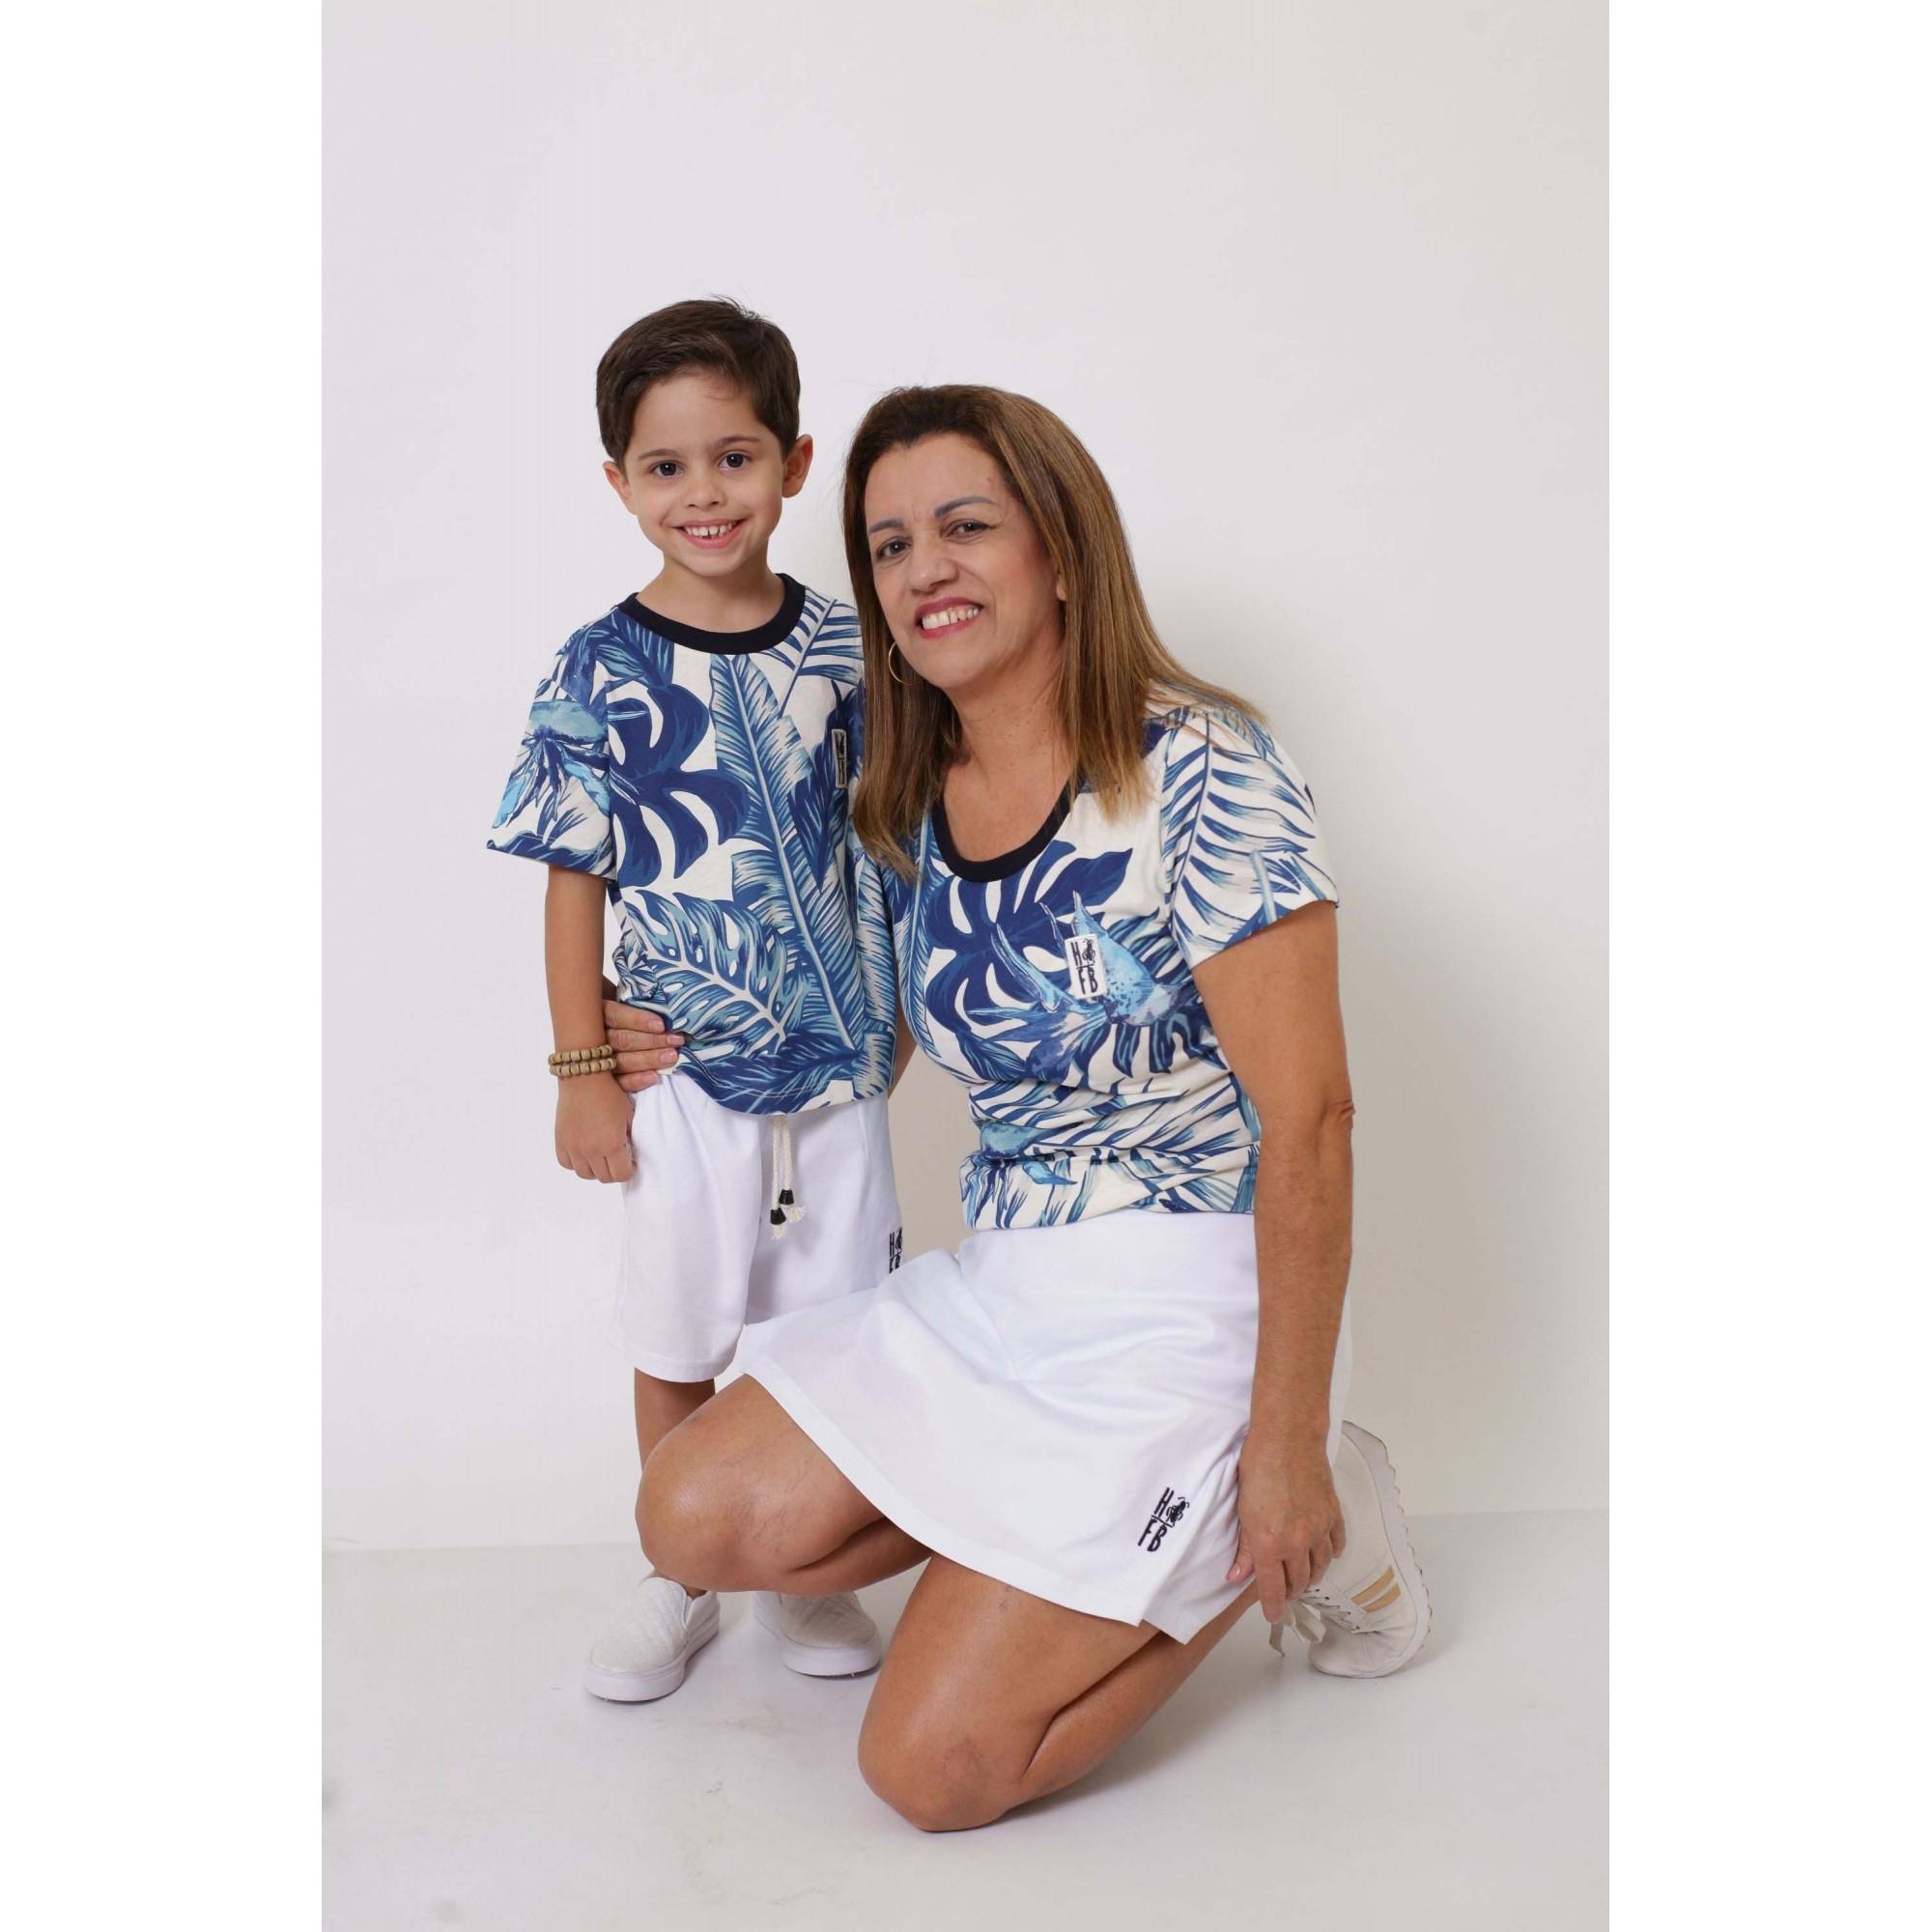 AVÓ E NETO > Kit 02 Peças T-Shirts - Caribe [Coleção Tal Avó Tal Neto]  - Heitor Fashion Brazil